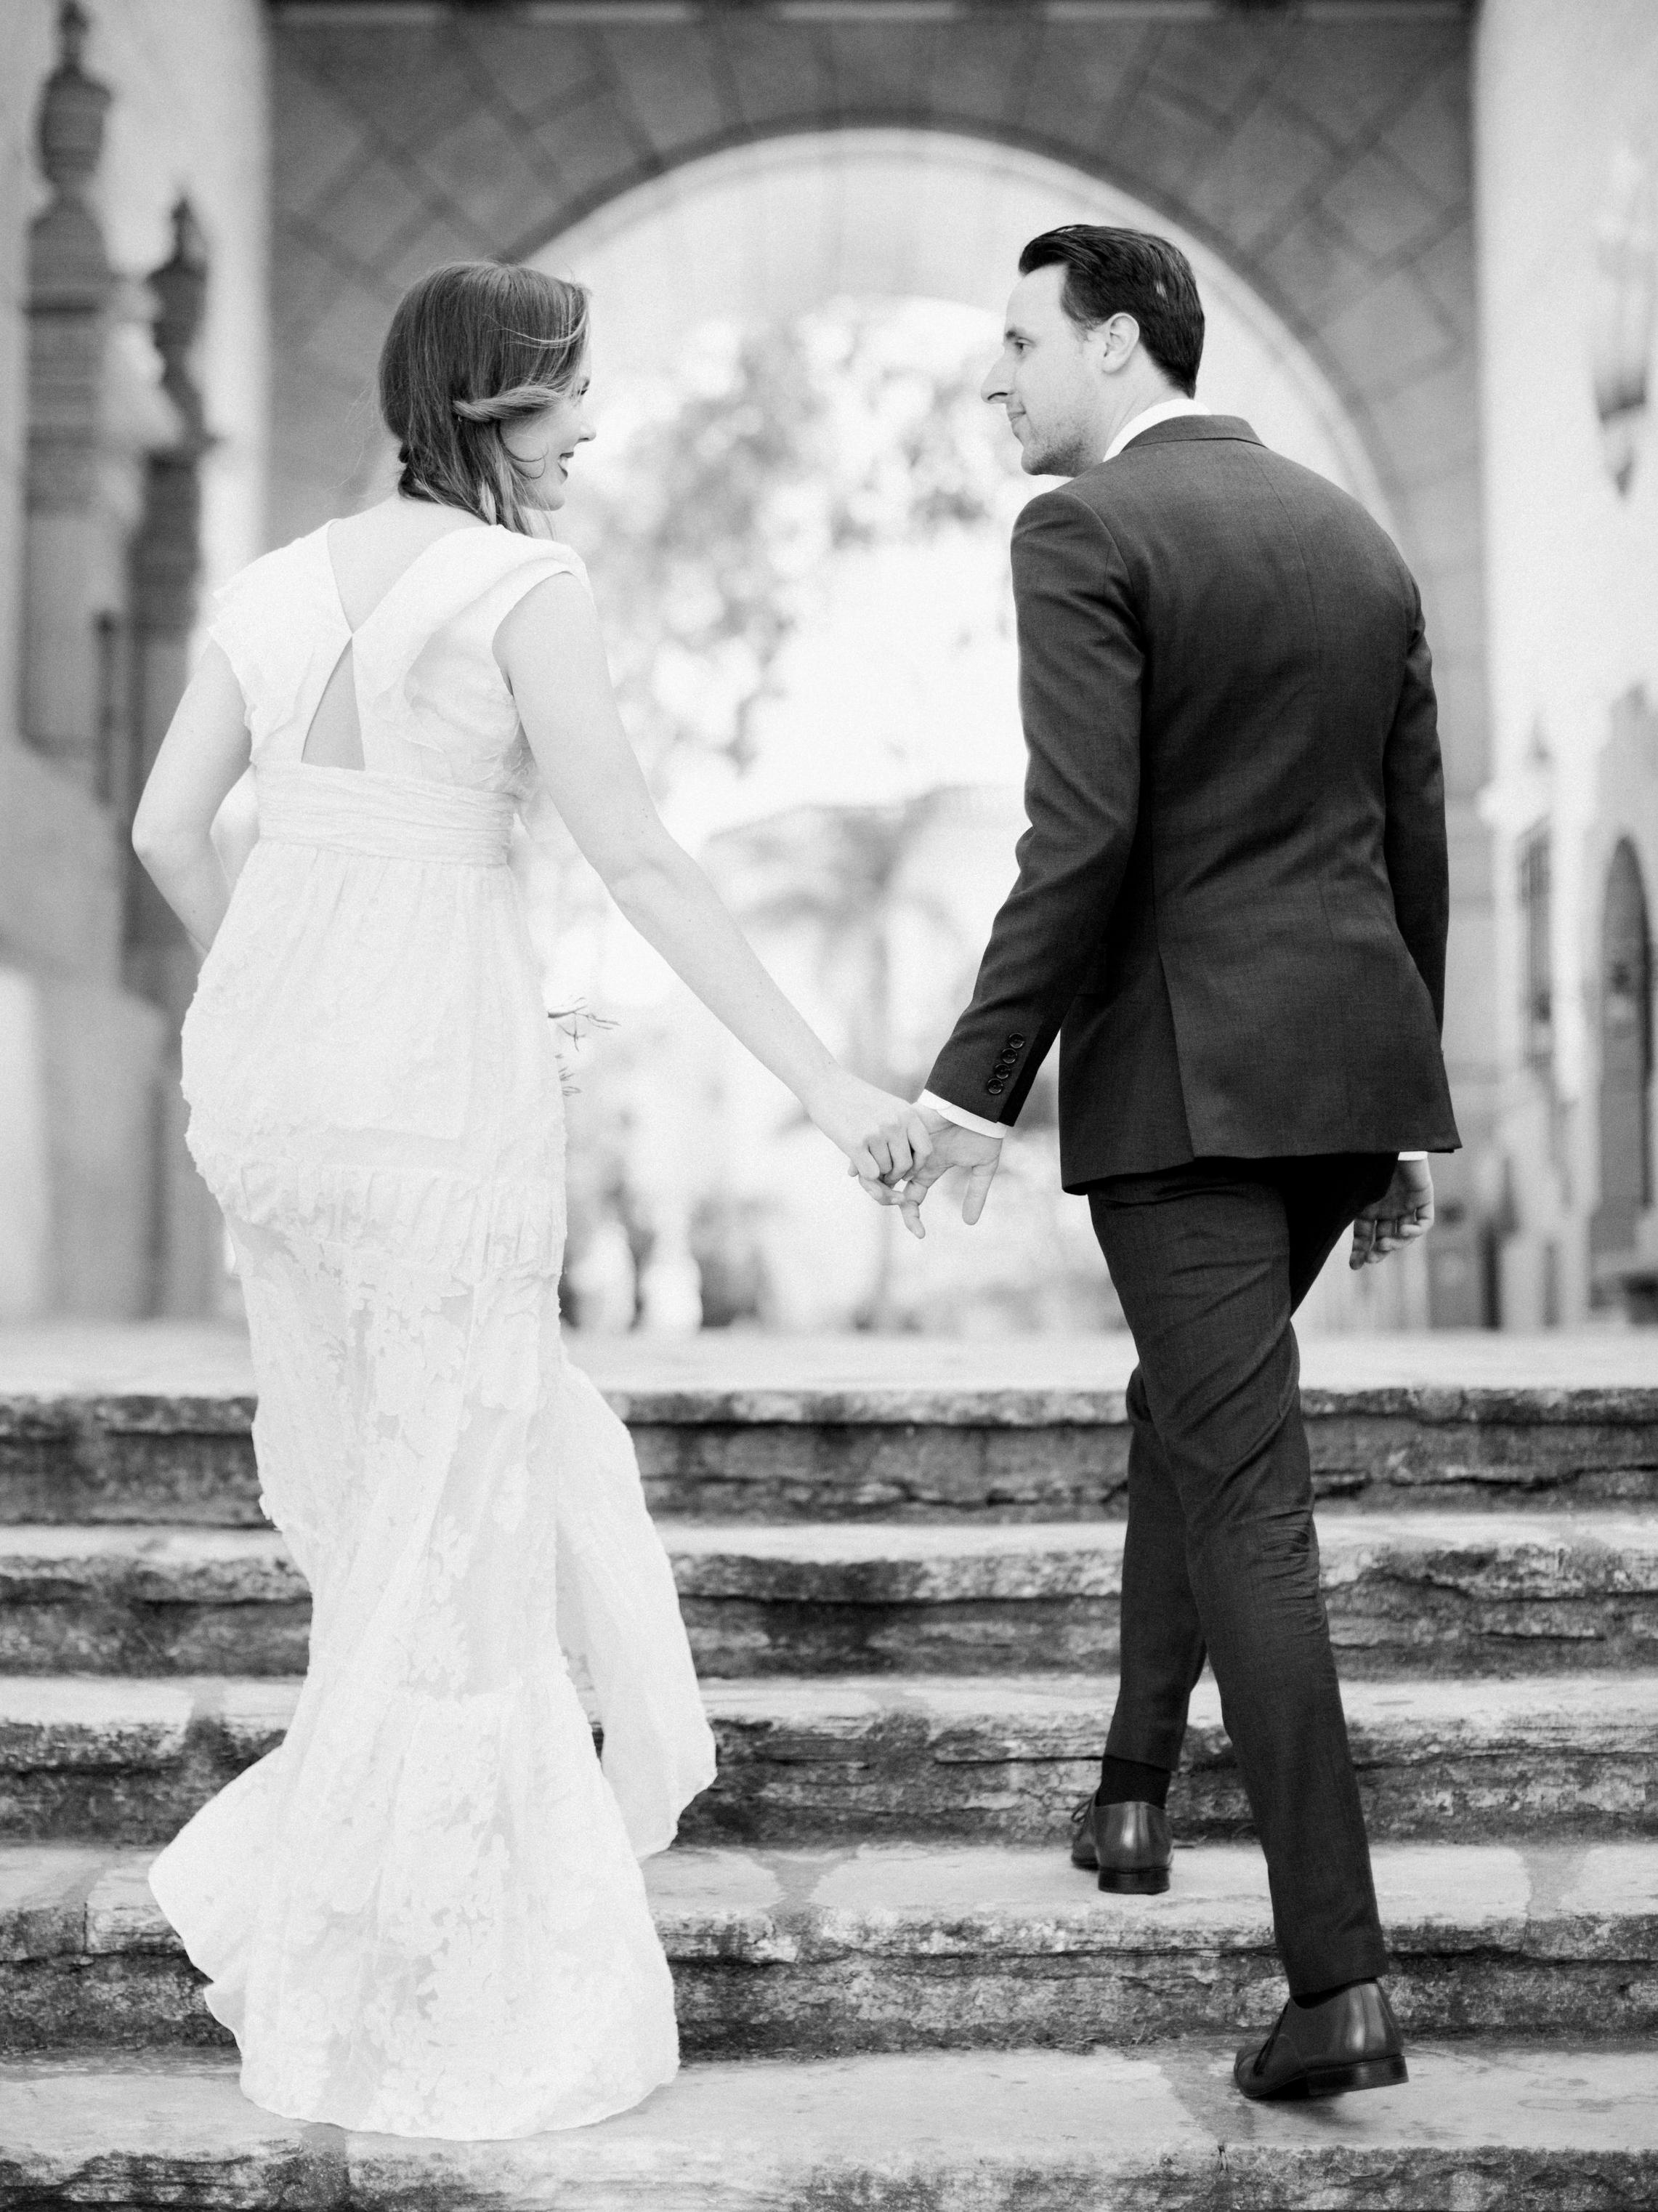 Anna-Delores-Photography-Santa-Barbara-Courthouse-Wedding-Elopement-Lisa-Brian-April-2017-0021-2.jpg